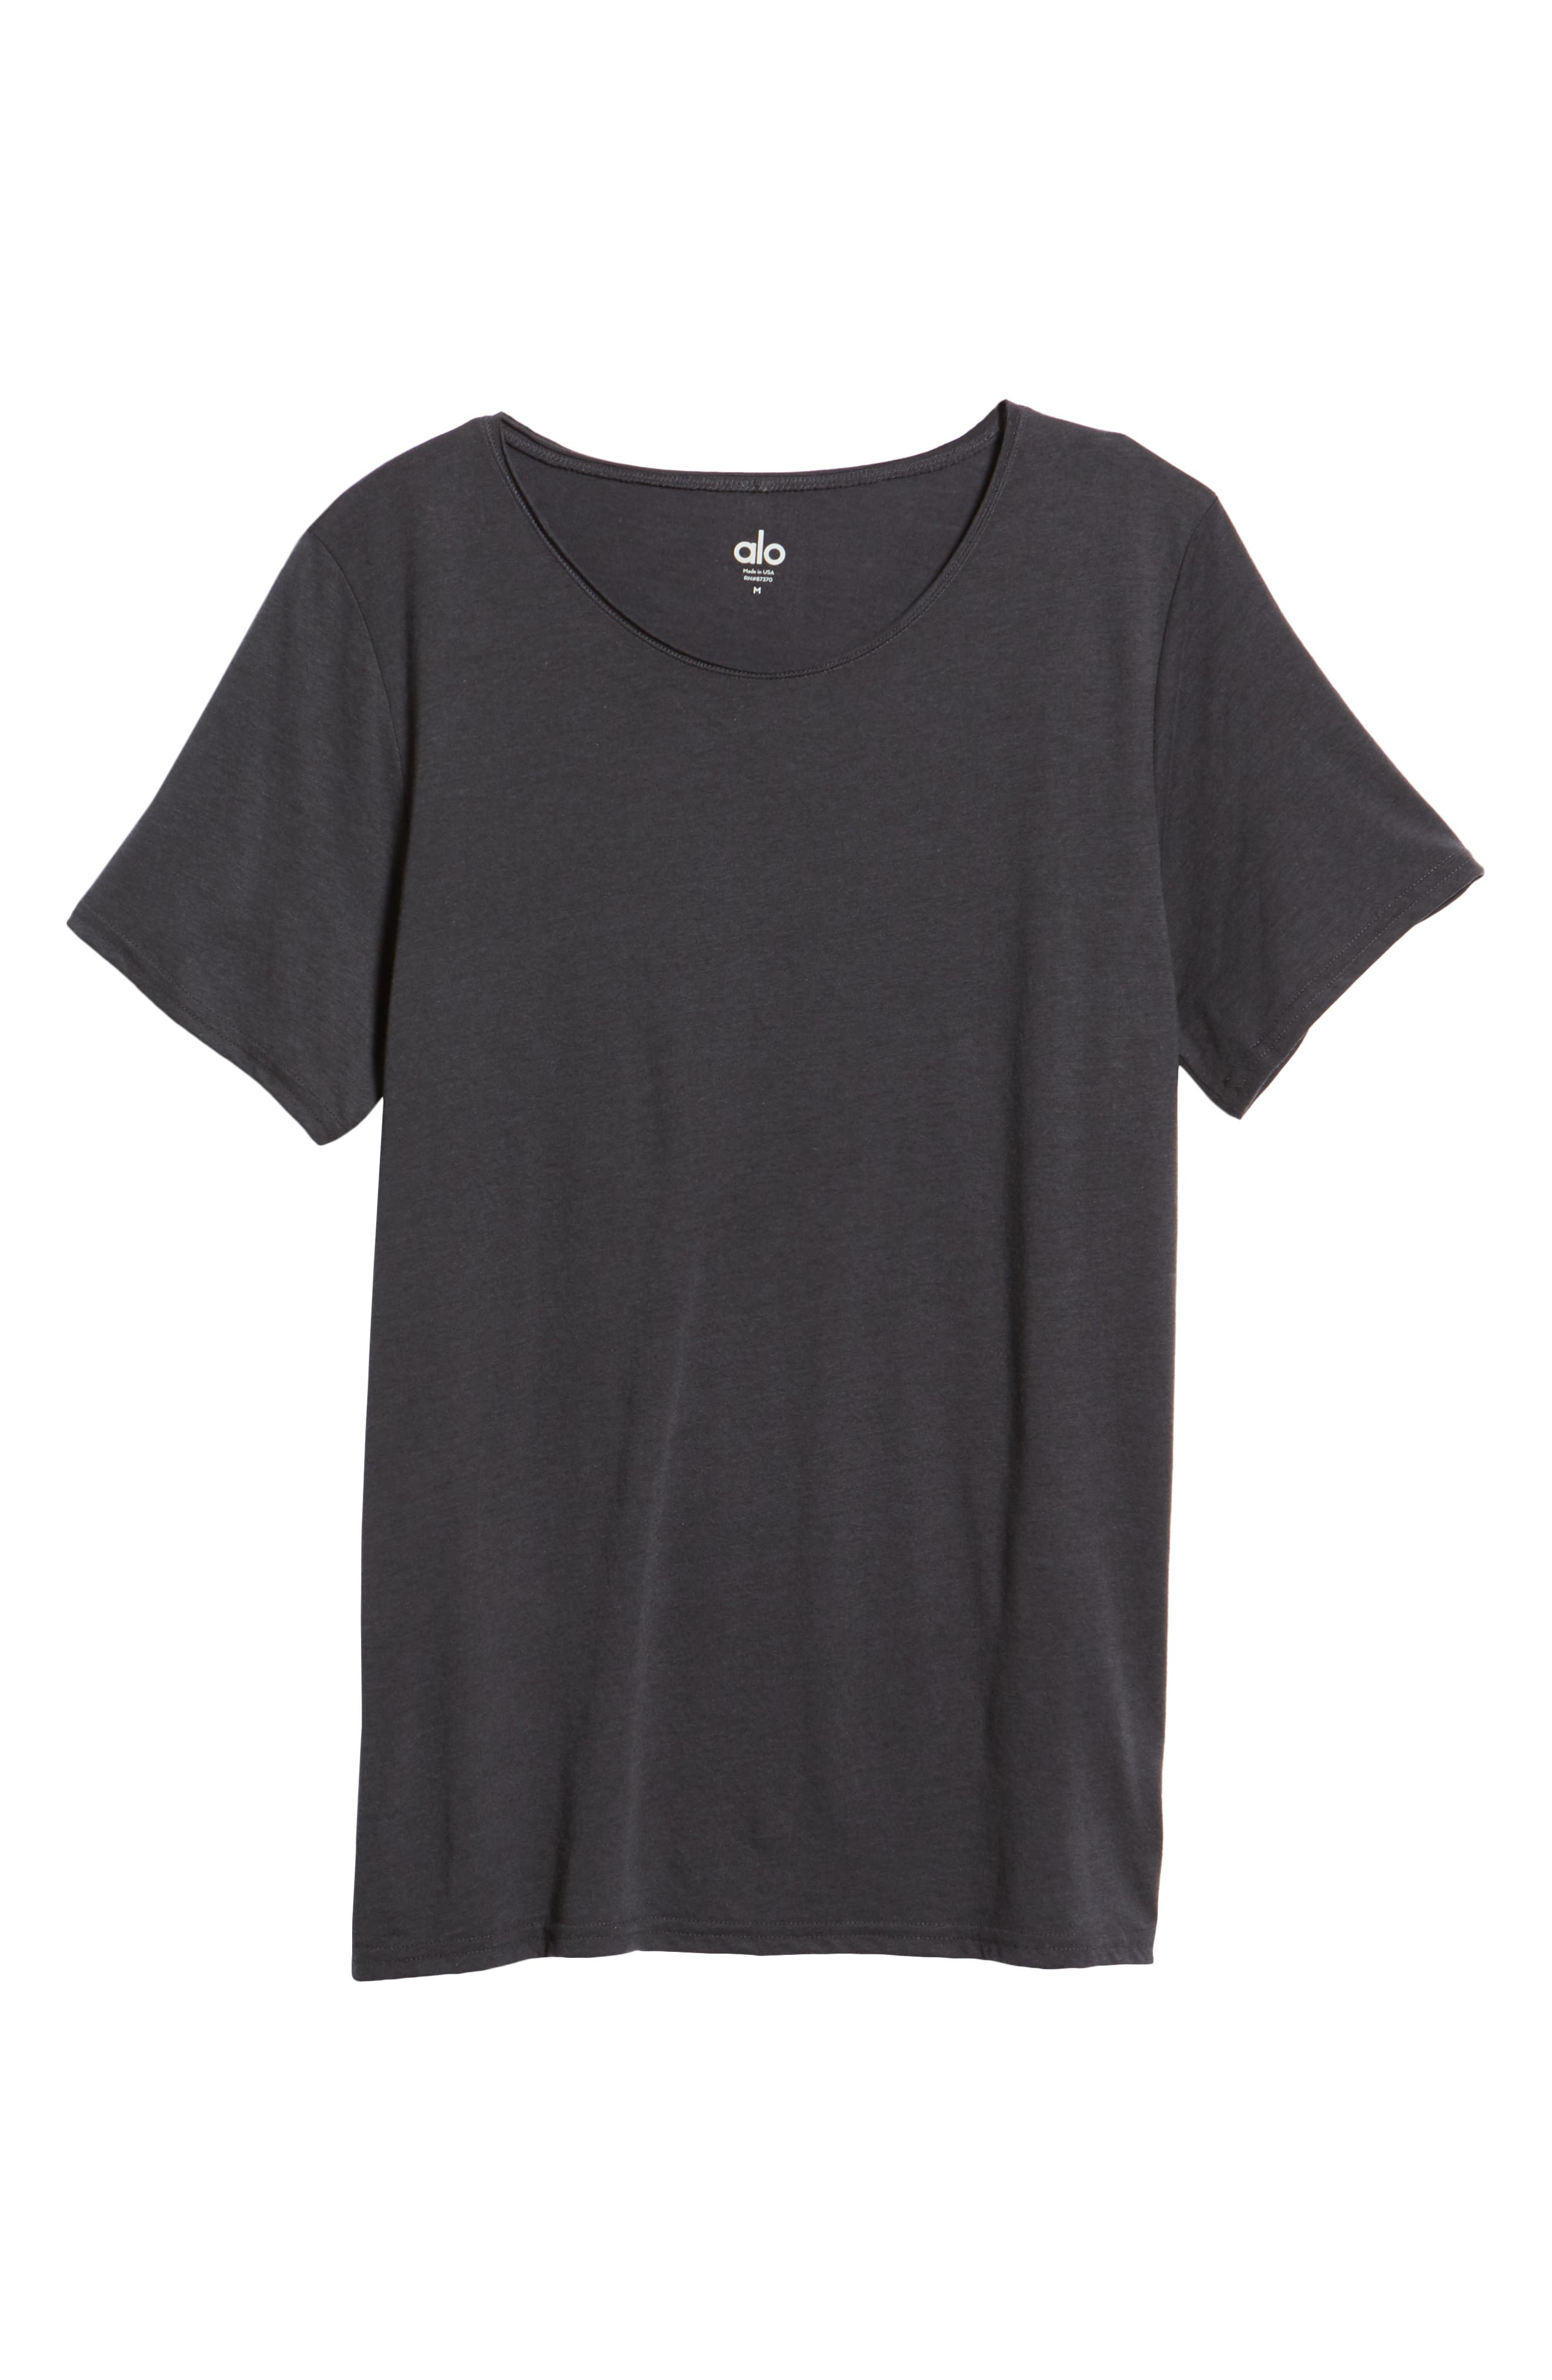 Ultimate T-Shirt,                             Alternate thumbnail 6, color,                             DARK GREY TRIBLEND